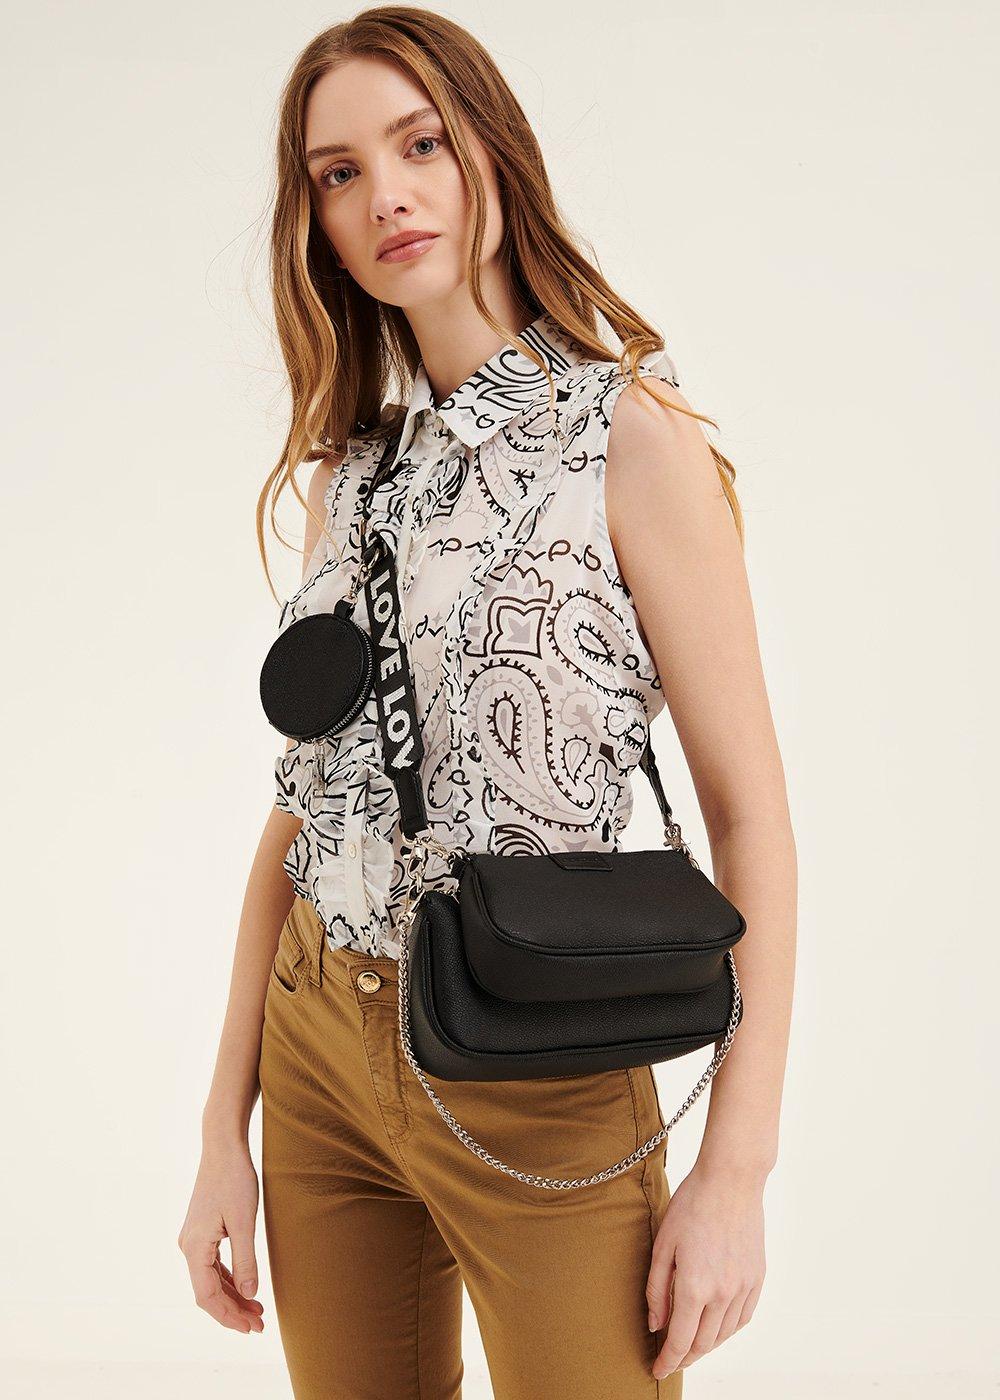 Barbara multi pochette bag - Black - Woman